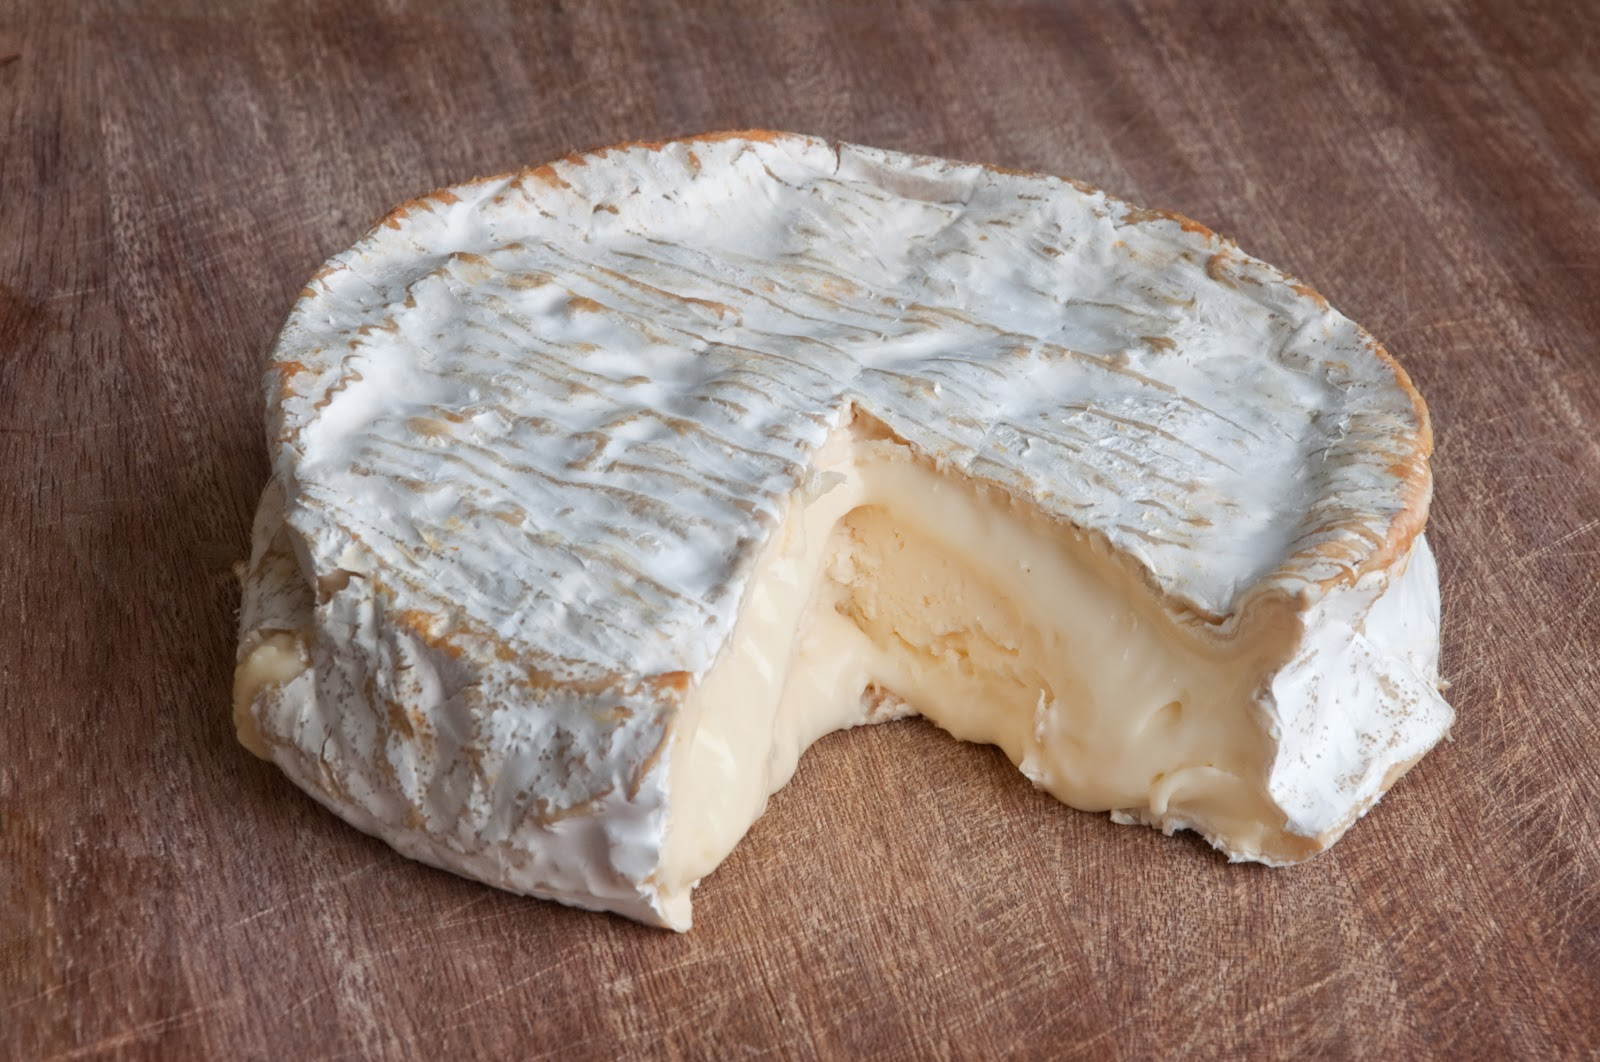 Wikimedia Commonsで発見した一切れ分だけ抜け落ちたクロミエチーズの写真